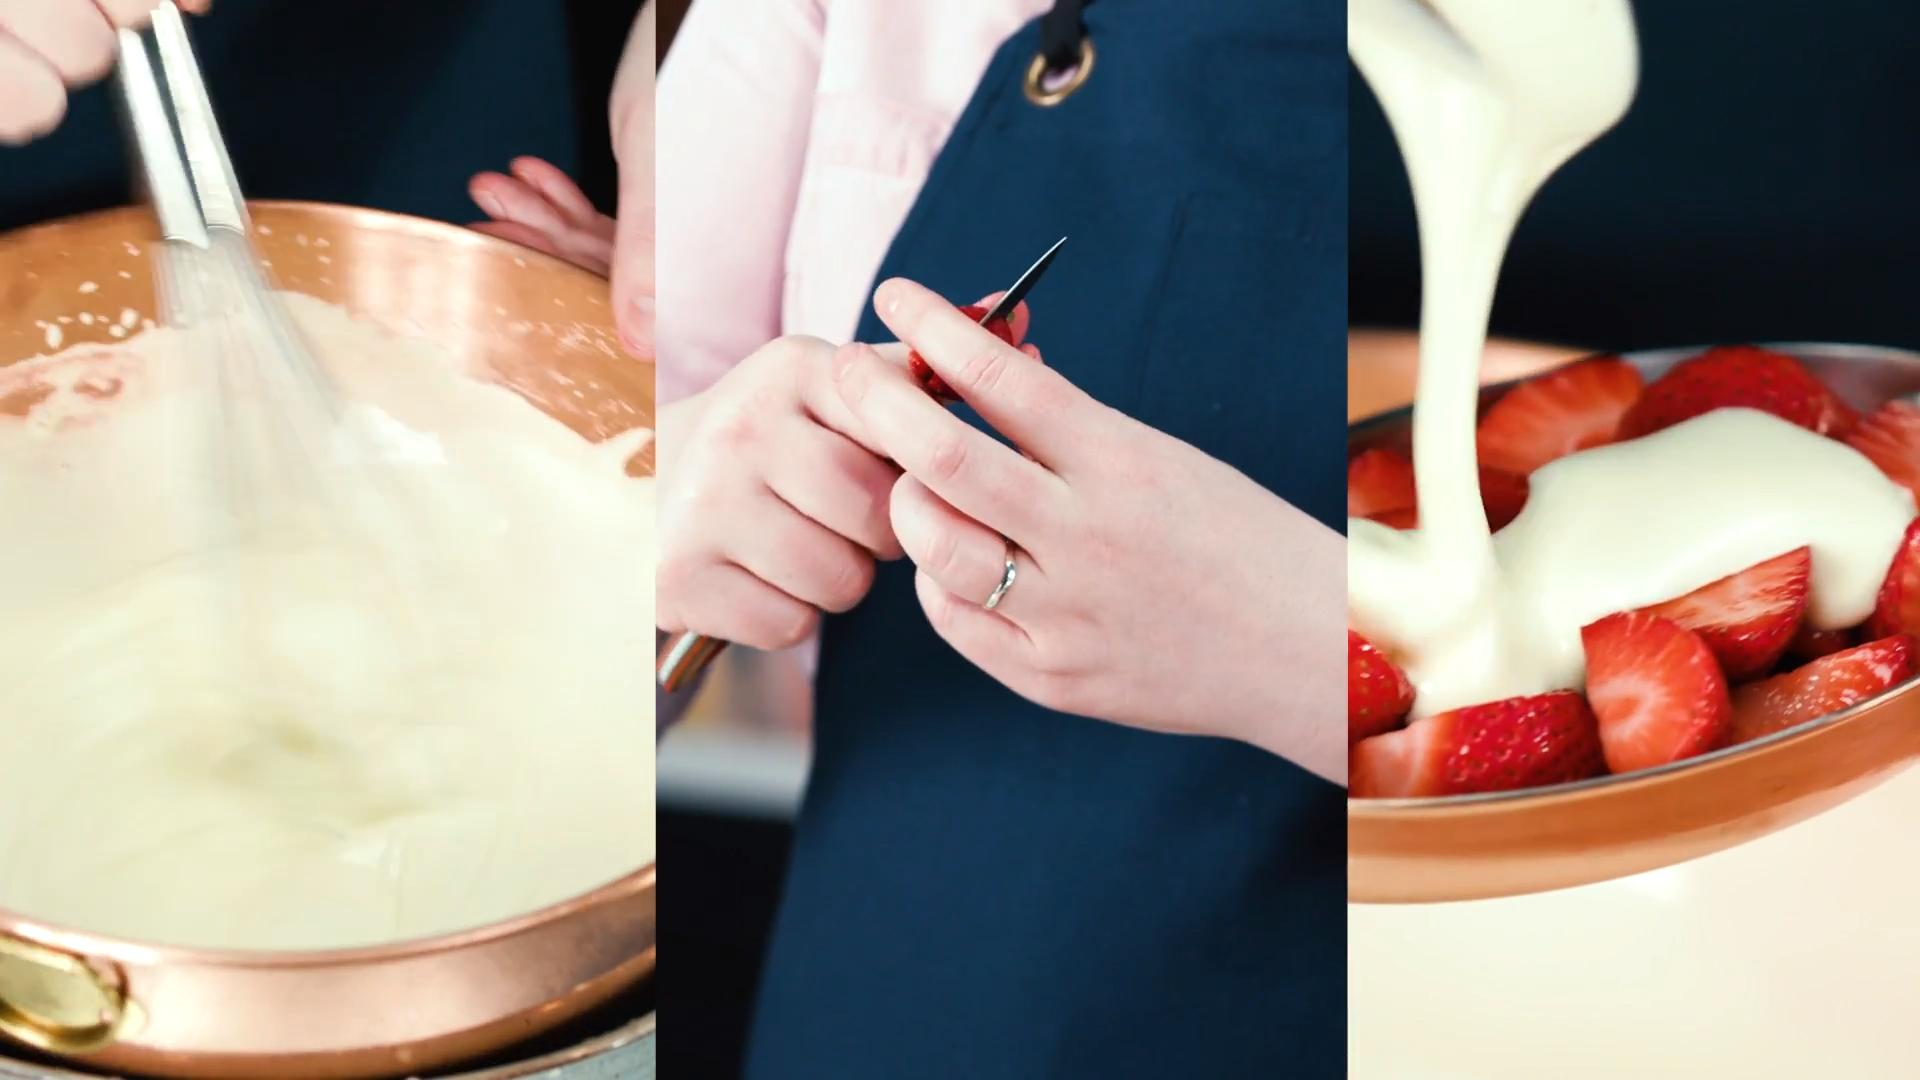 Make This Elegant, Boozy Strawberry Dessert in Less Than 30 Minutes